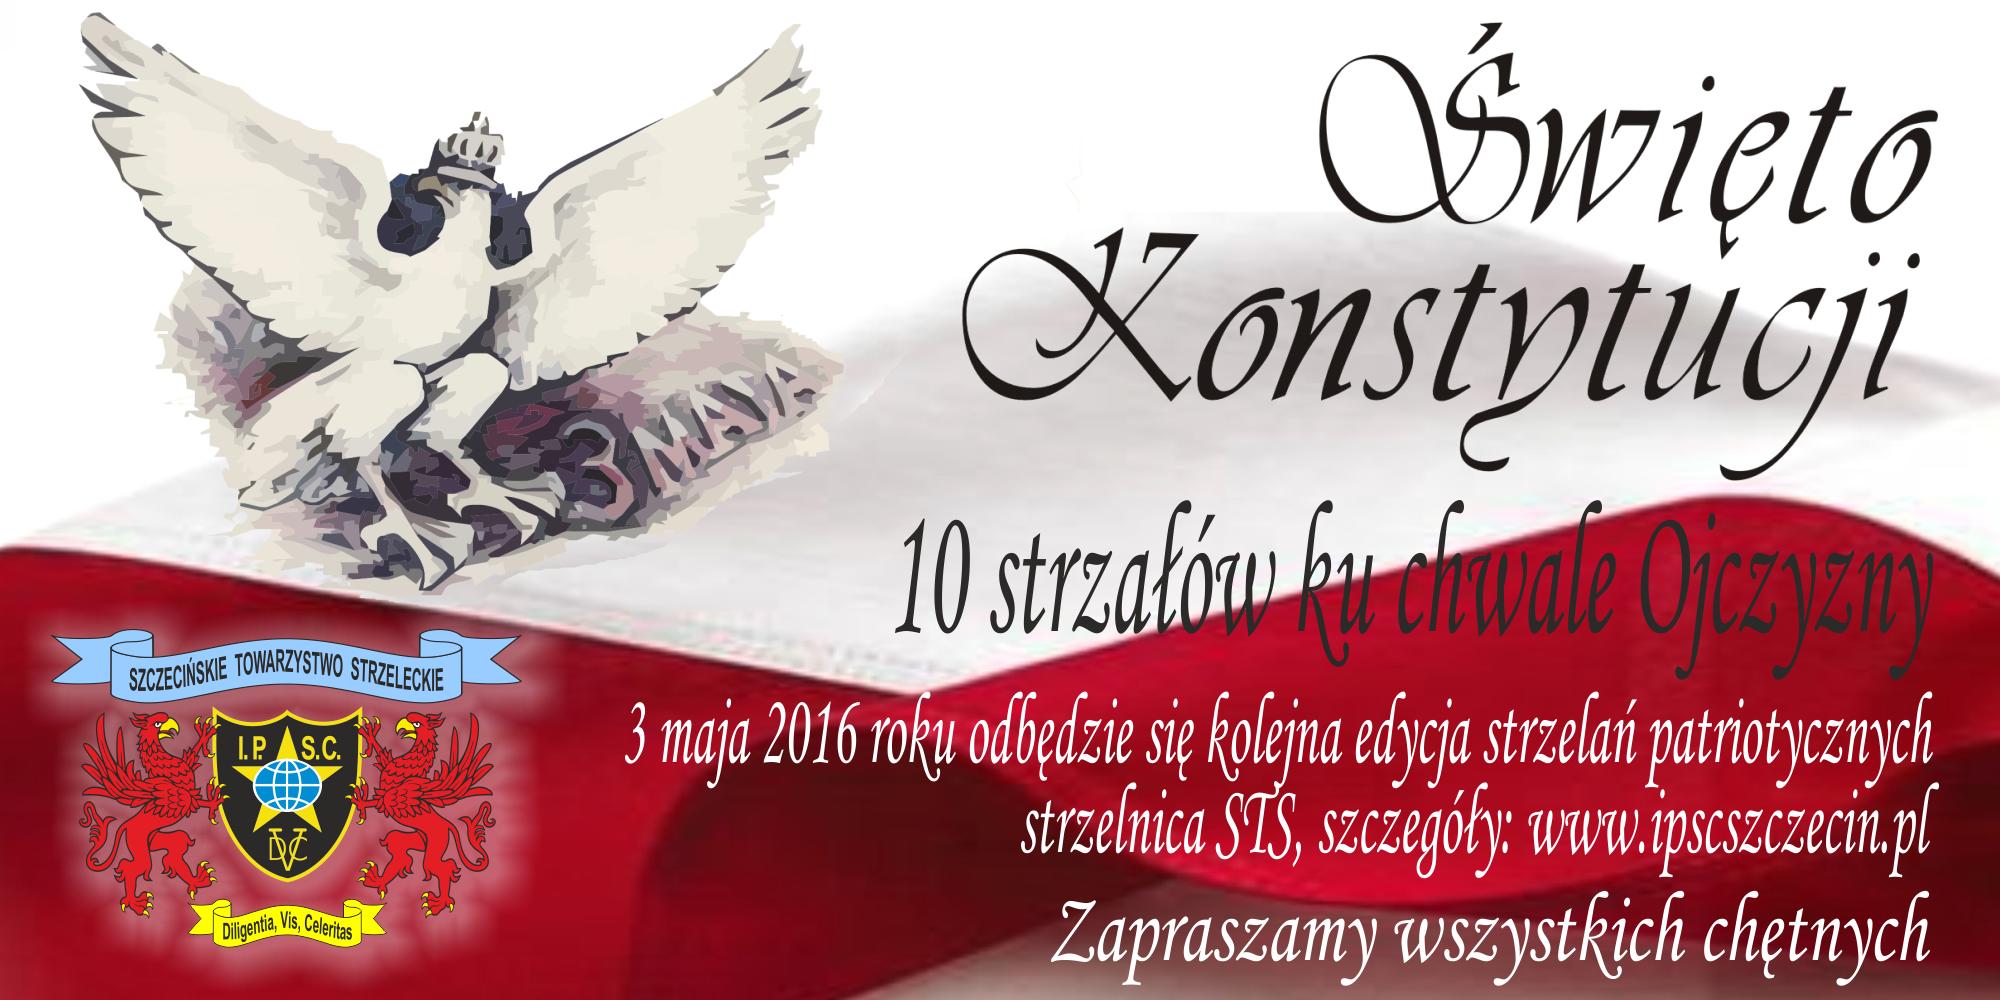 20160503_reklama